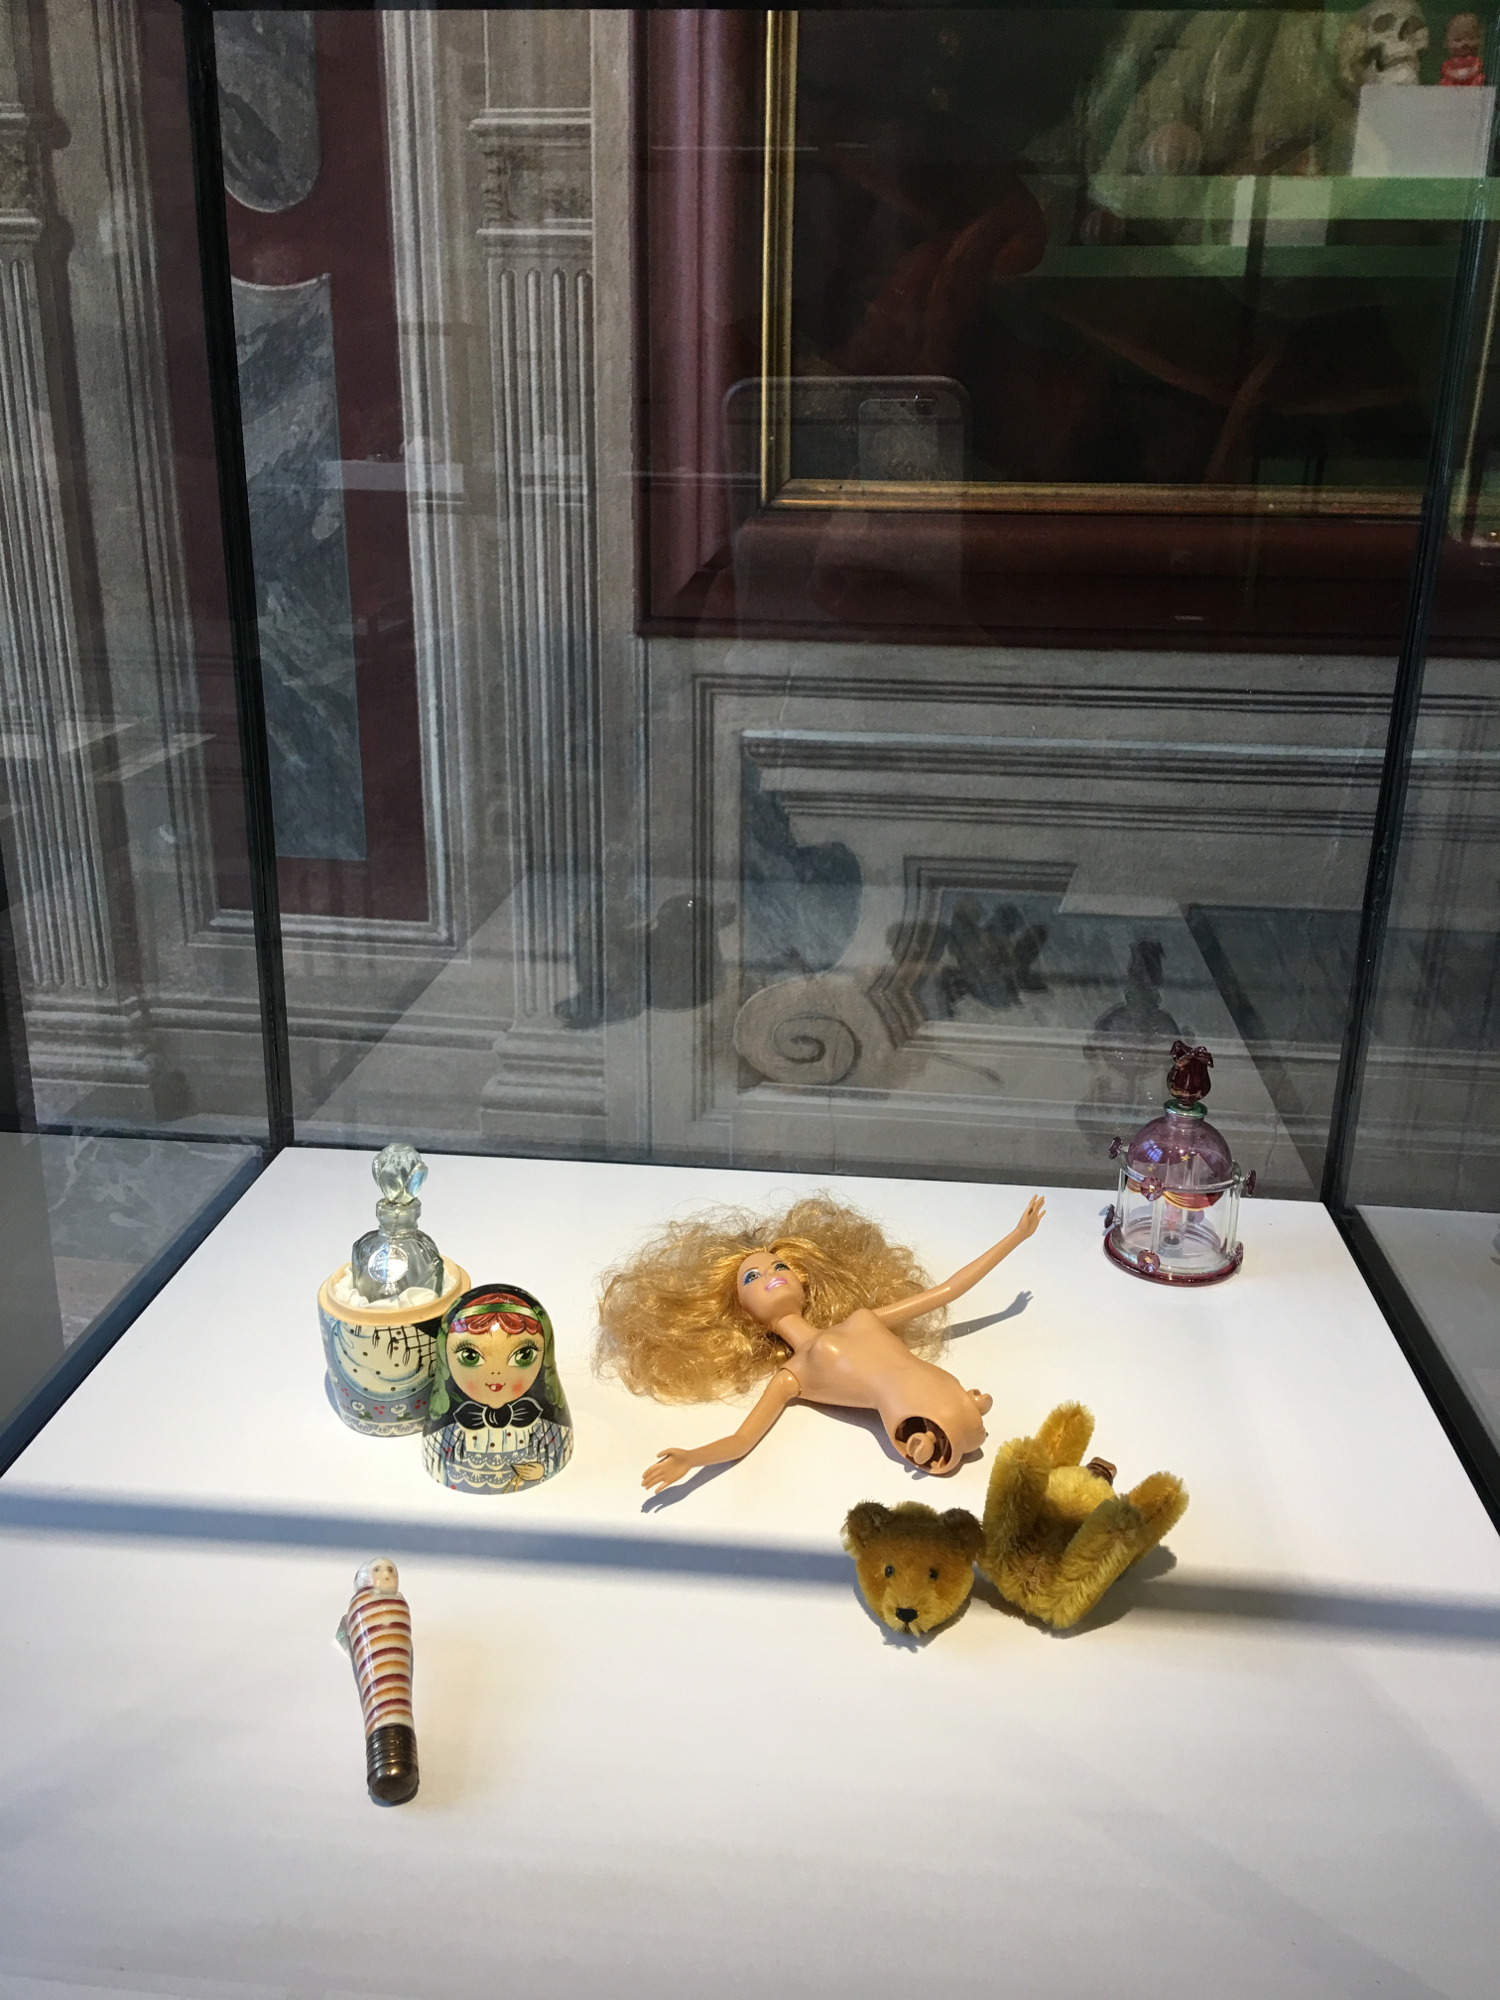 rocaille-blog-venezia-palazzo-mocenigo-cabinet-of-curiosities-collezione-storp-profumo-8